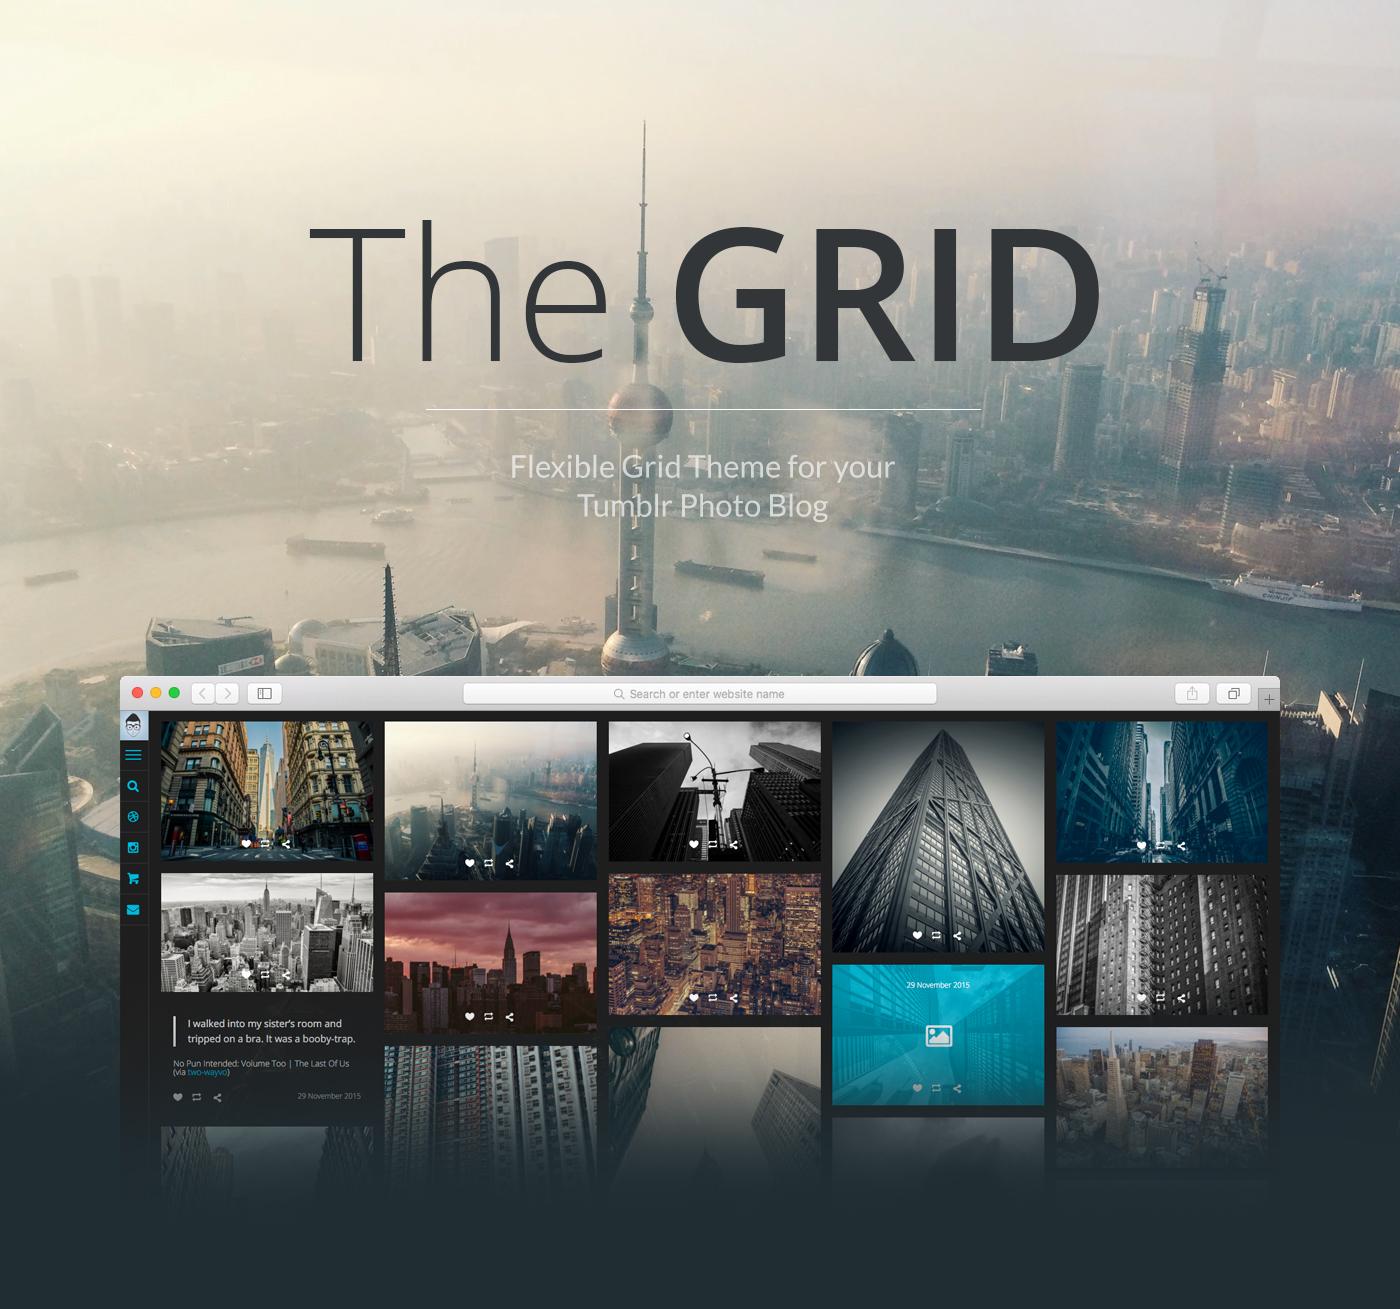 The GRID - Premium Tumblr Theme on Behance